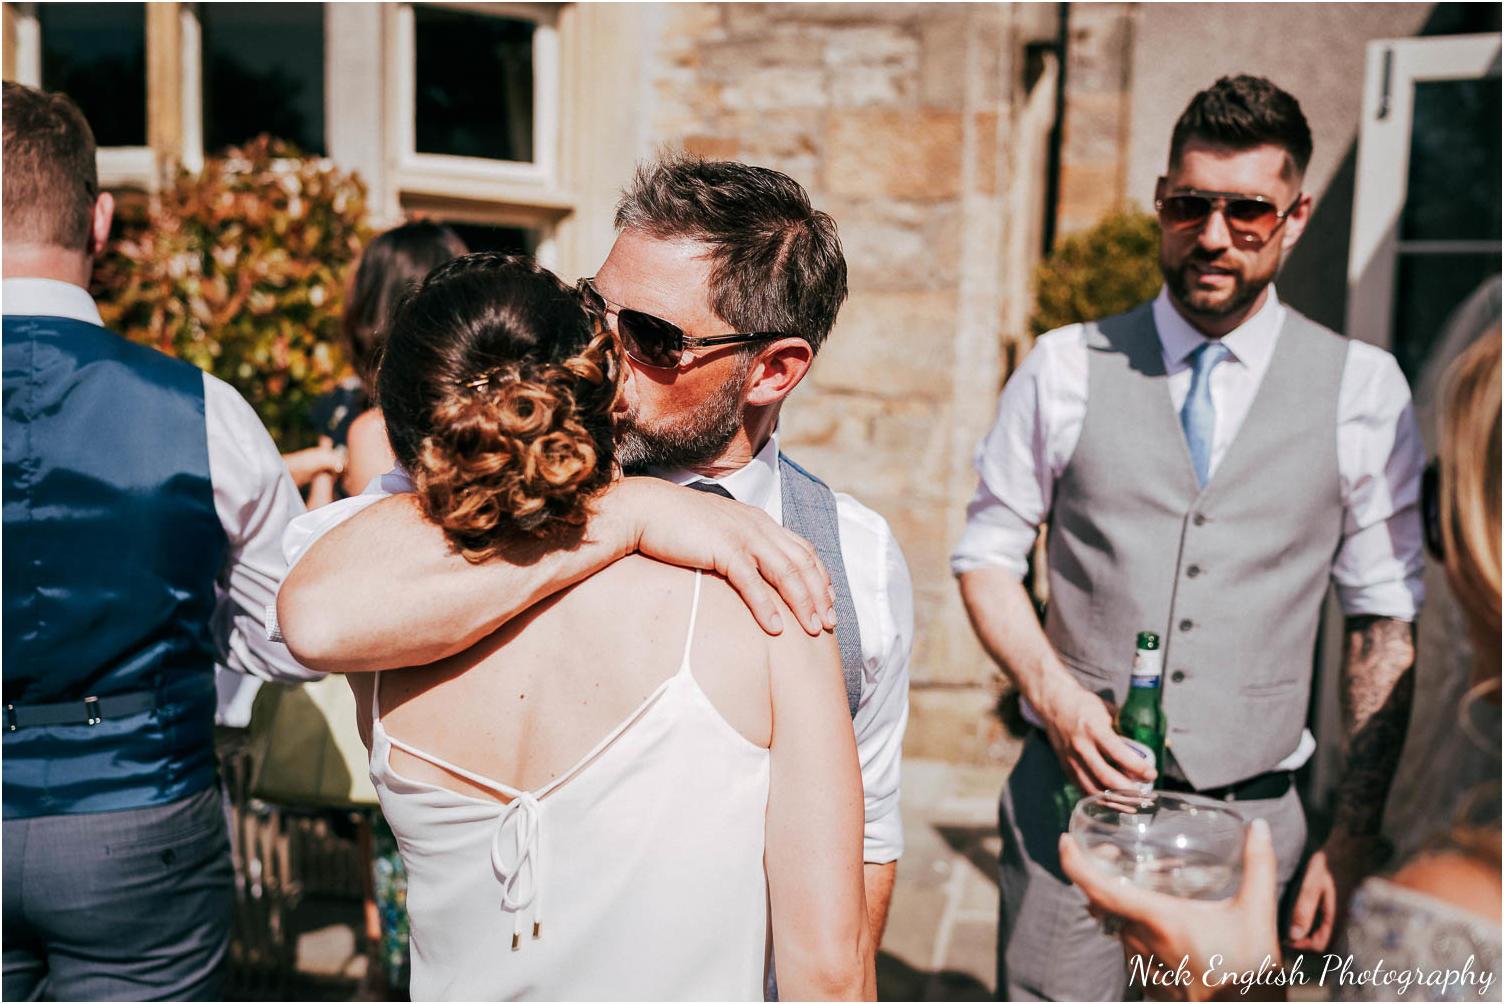 Mitton_Hall_Wedding_Photographer-60.jpg